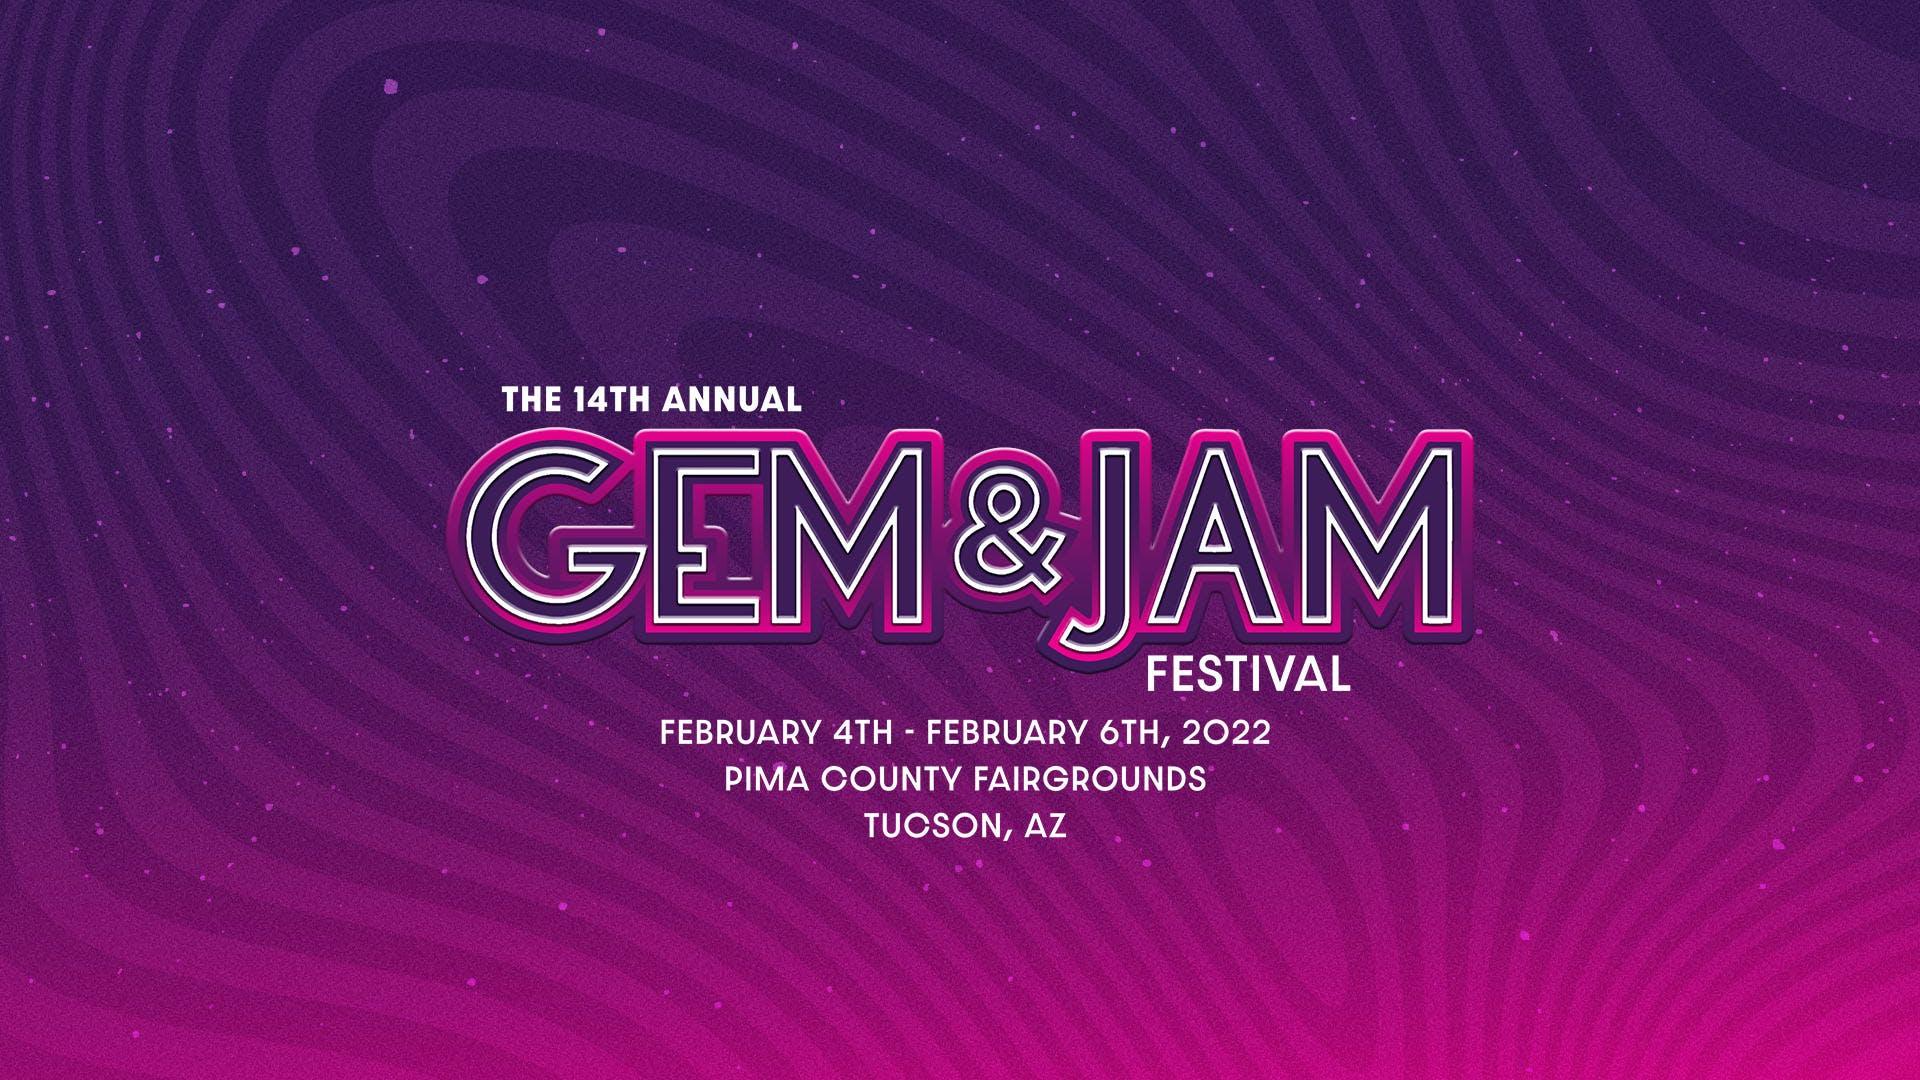 Gem & Jam Festival 2022